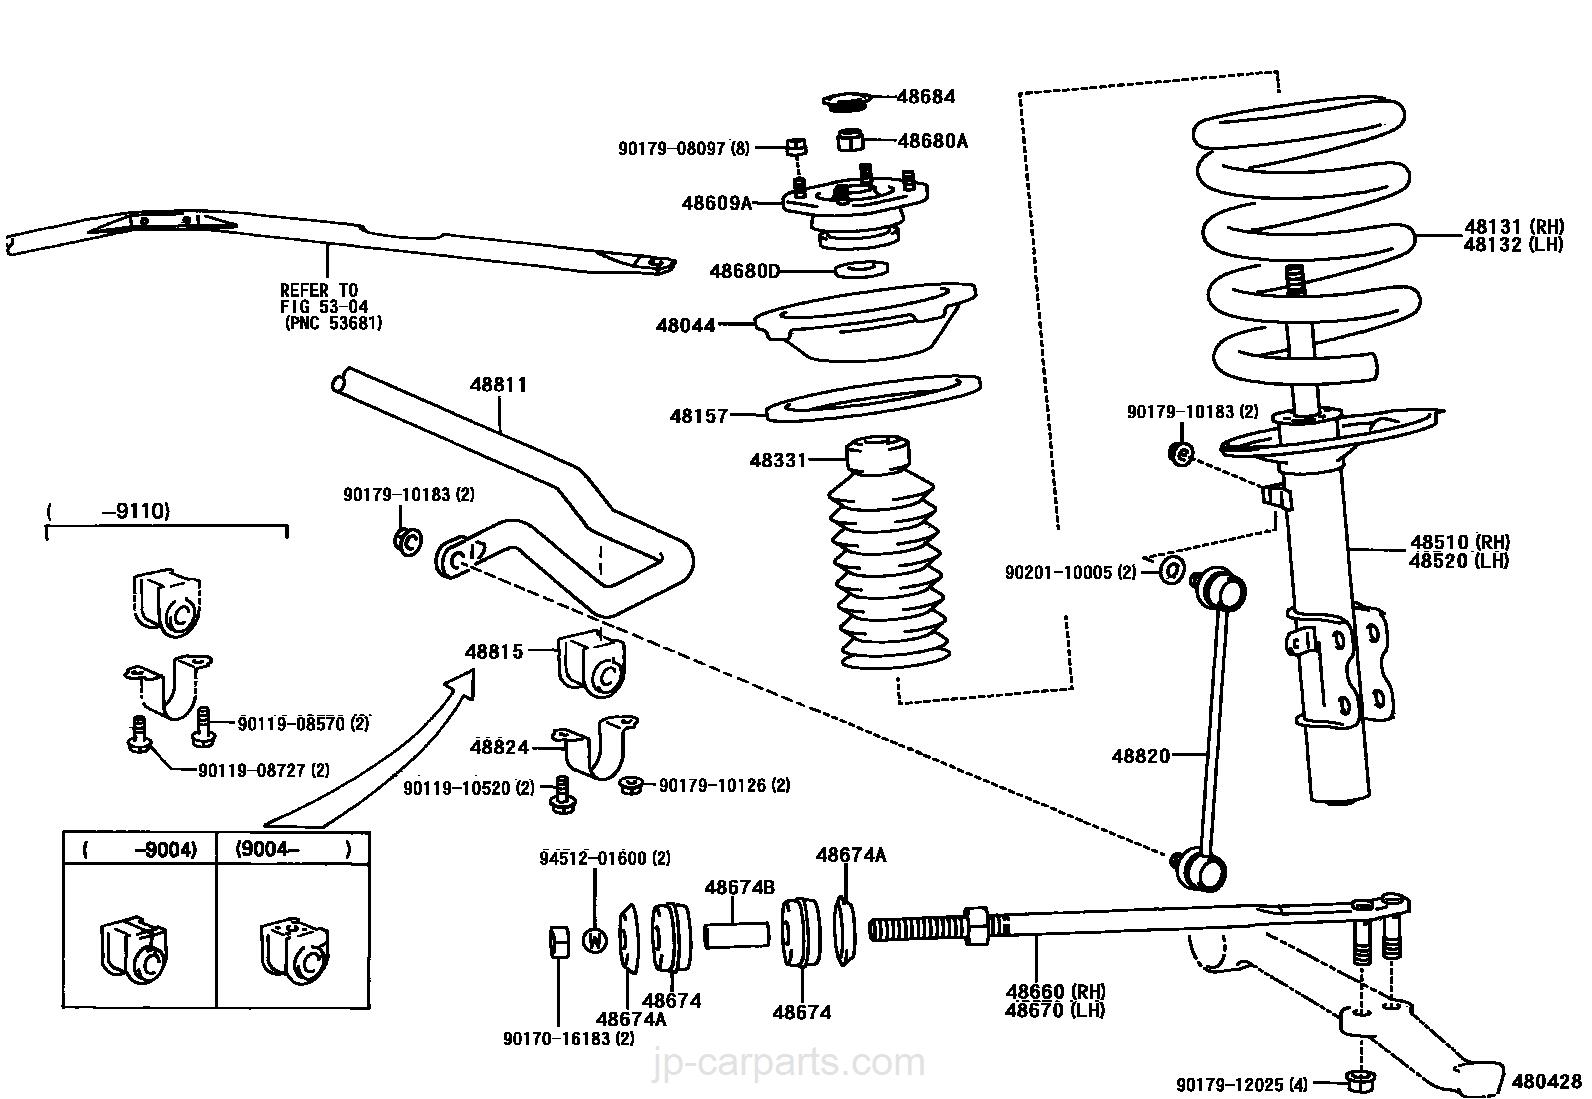 1991 Toyota Mr2 Parts Diagram Trusted Schematics 91 Cressida Wiring Schematic Diagrams 2004 Tundra